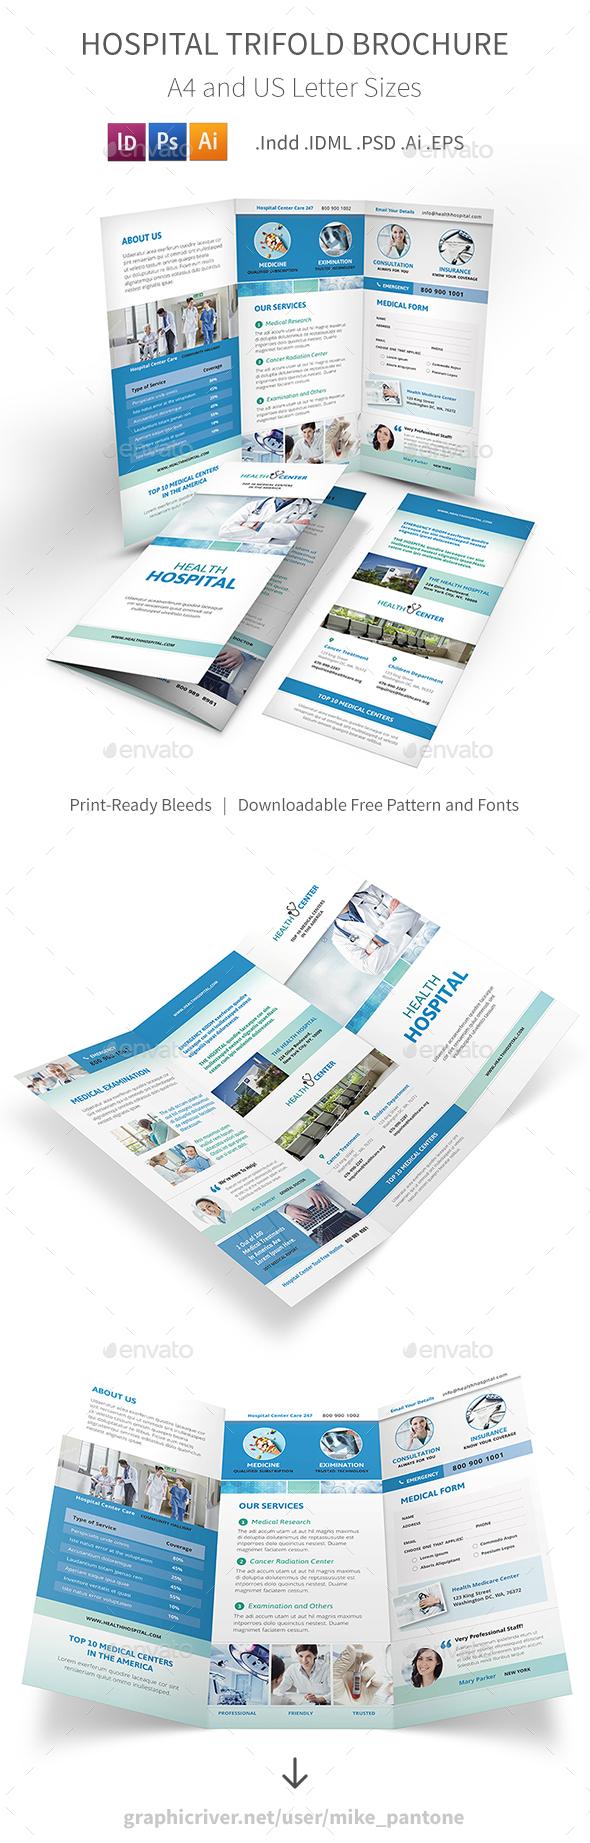 Hospital Trifold Brochure - Informational Brochures